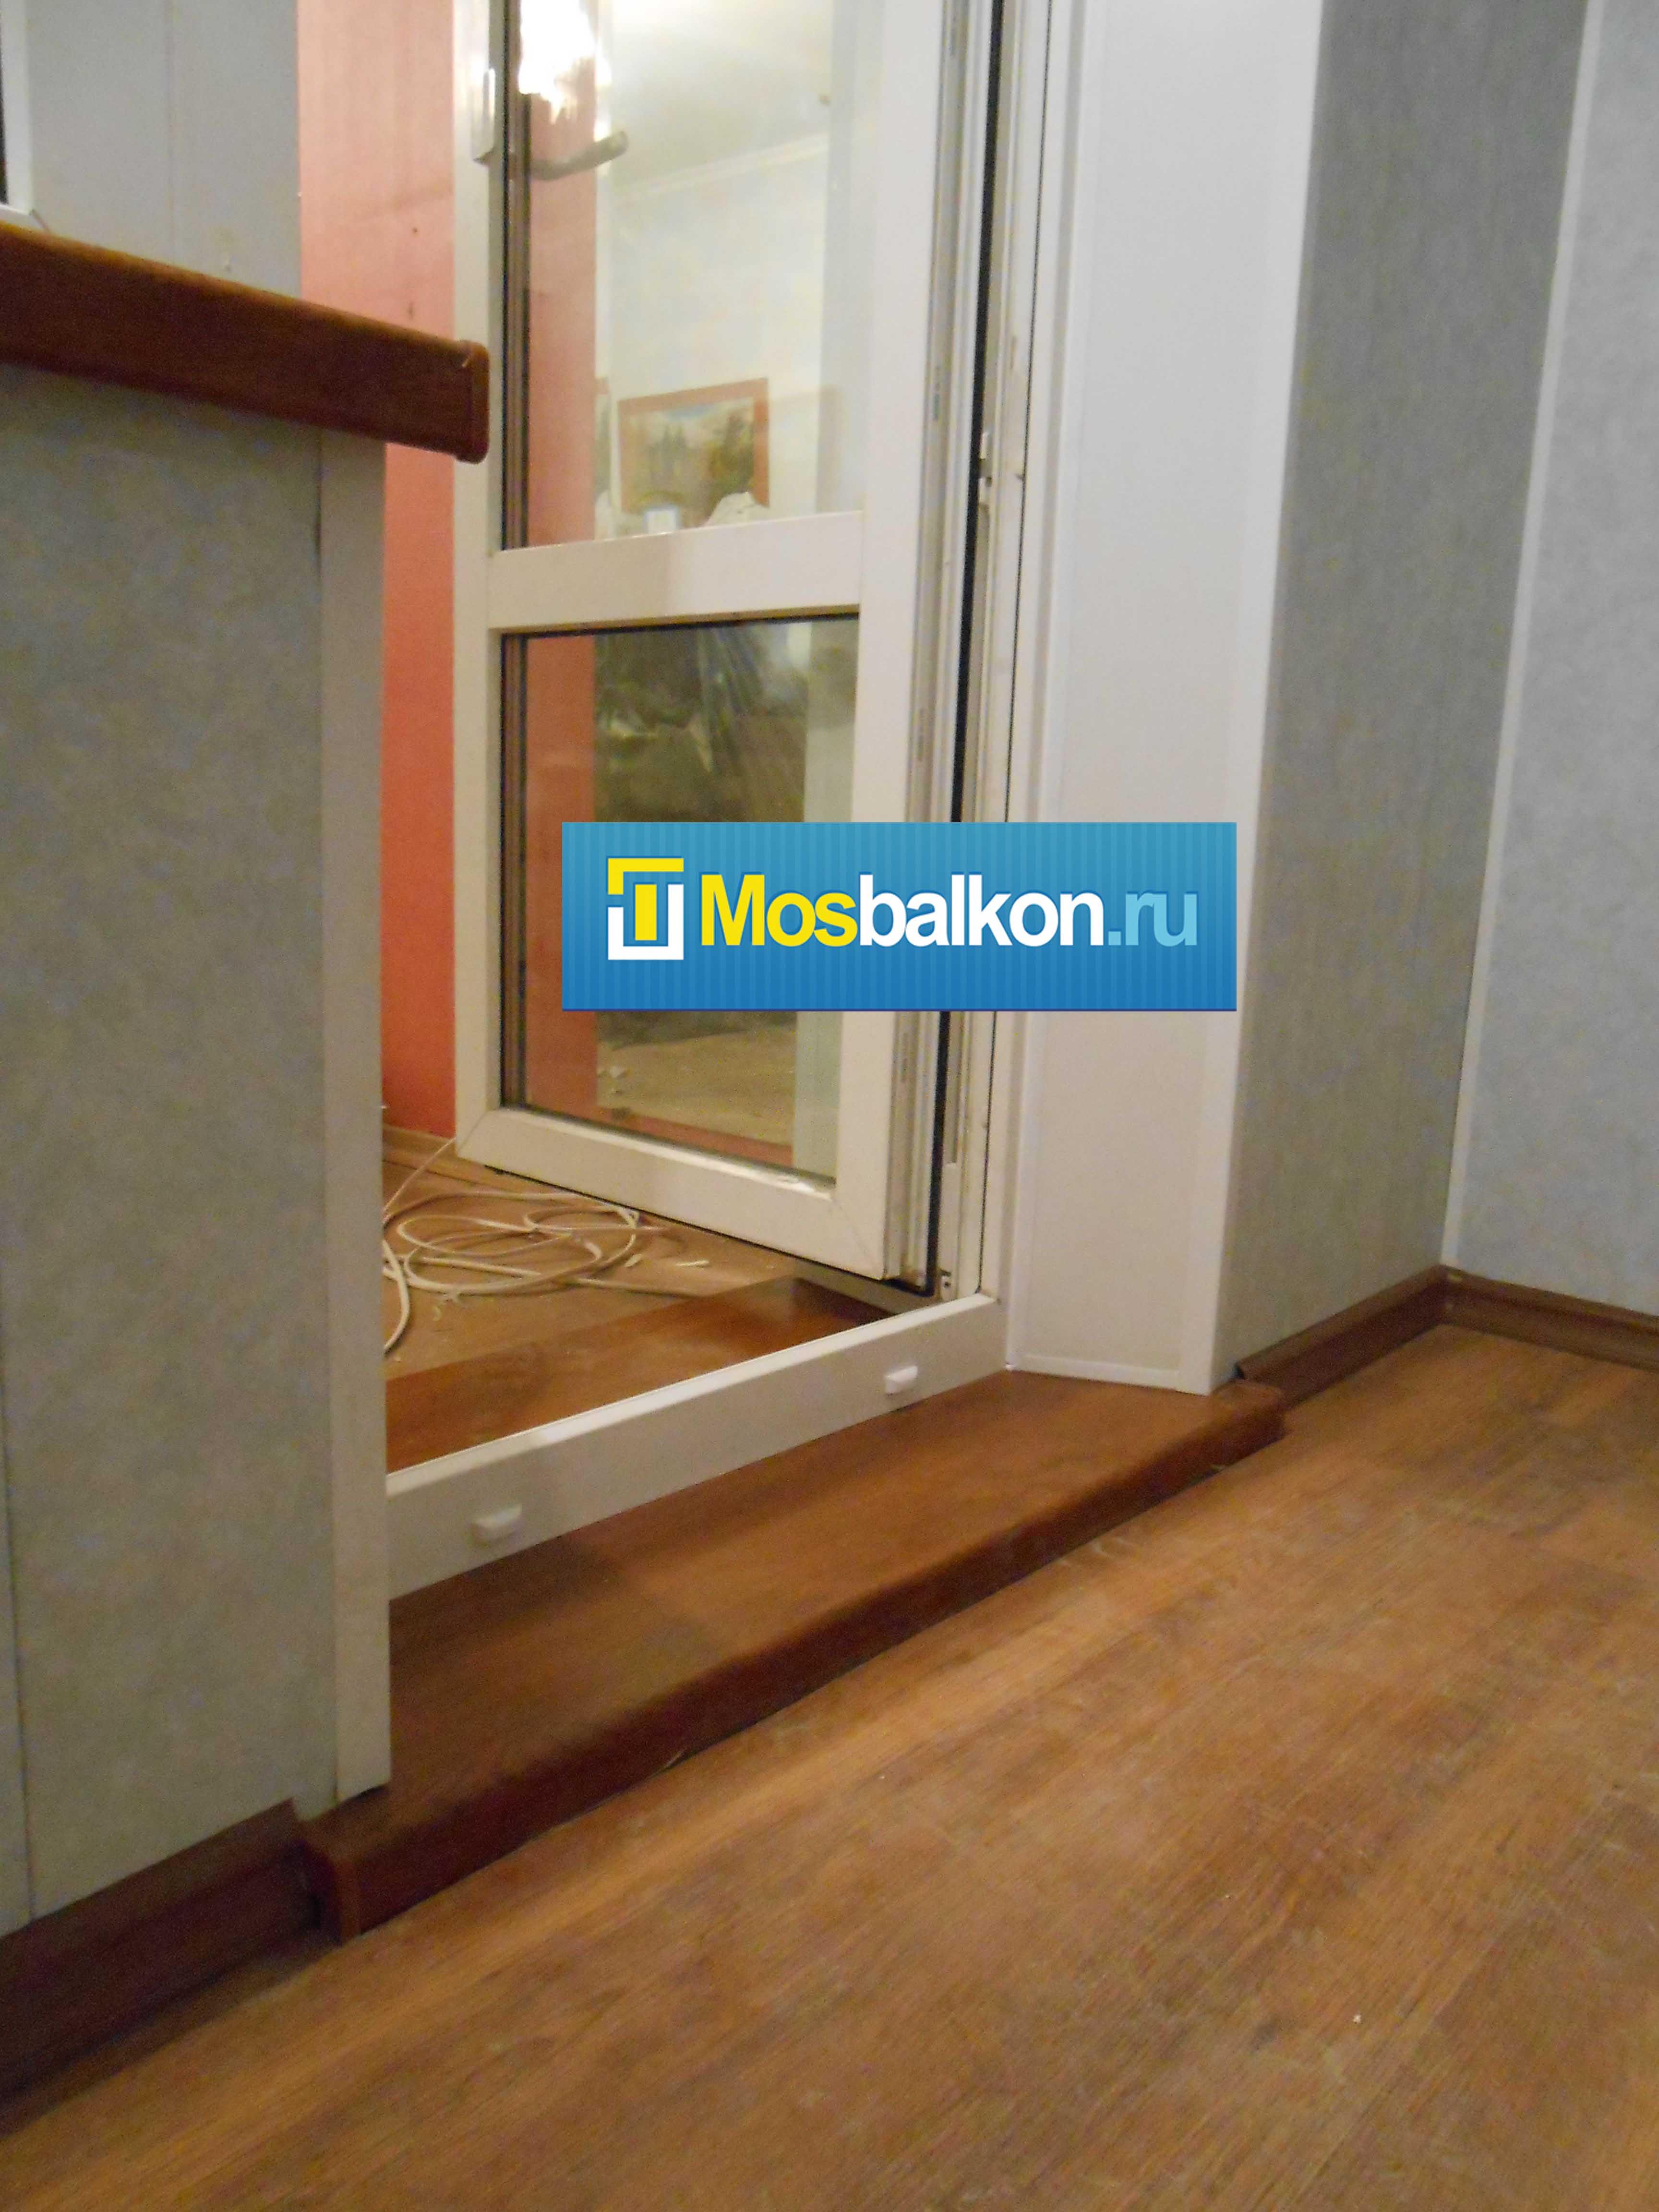 Установка пластикого балконного порога.